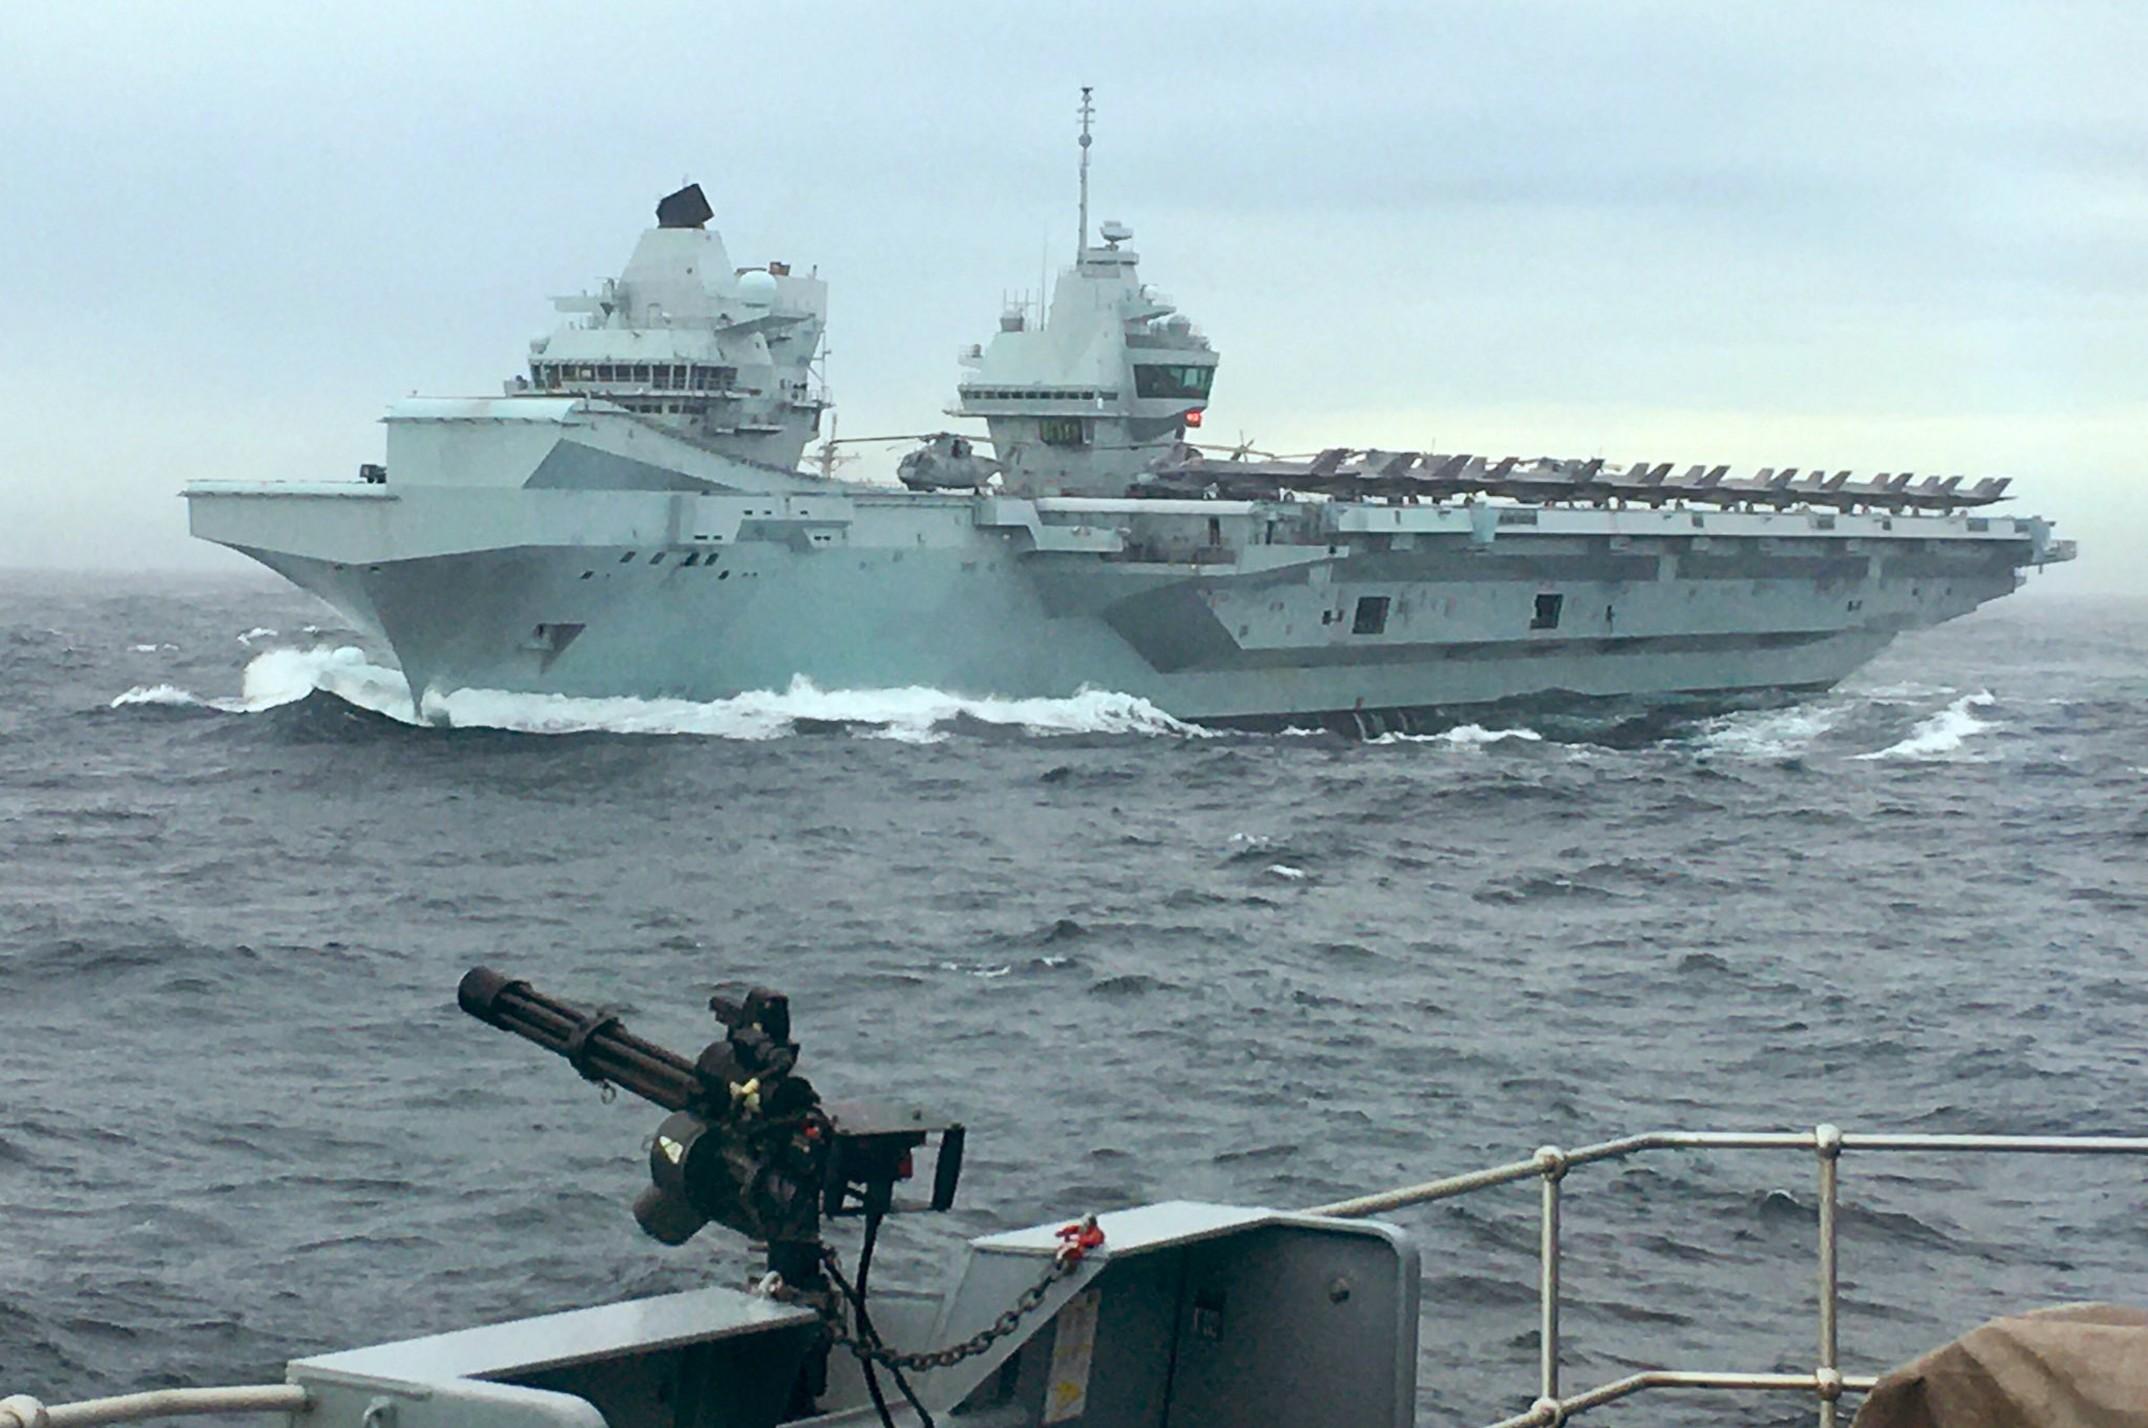 HMS Queen Elizabeth launches F-35Bs to 'intercept suspicious aircraft'